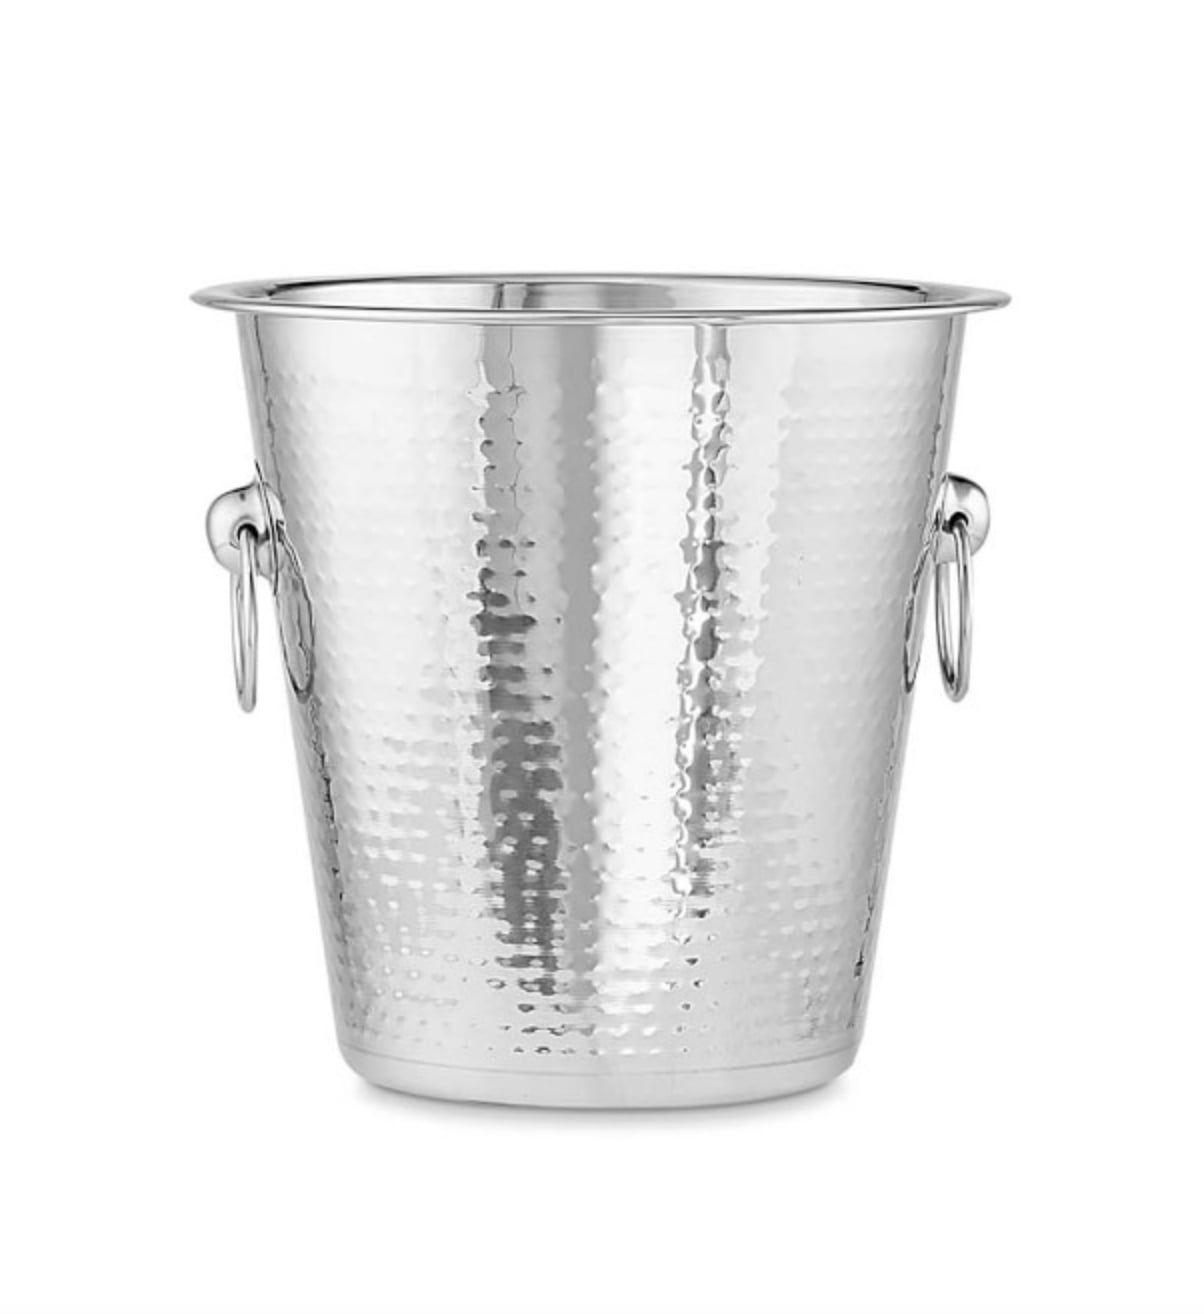 williams-sonoma-hammered-stainless-steel-wine-bucket